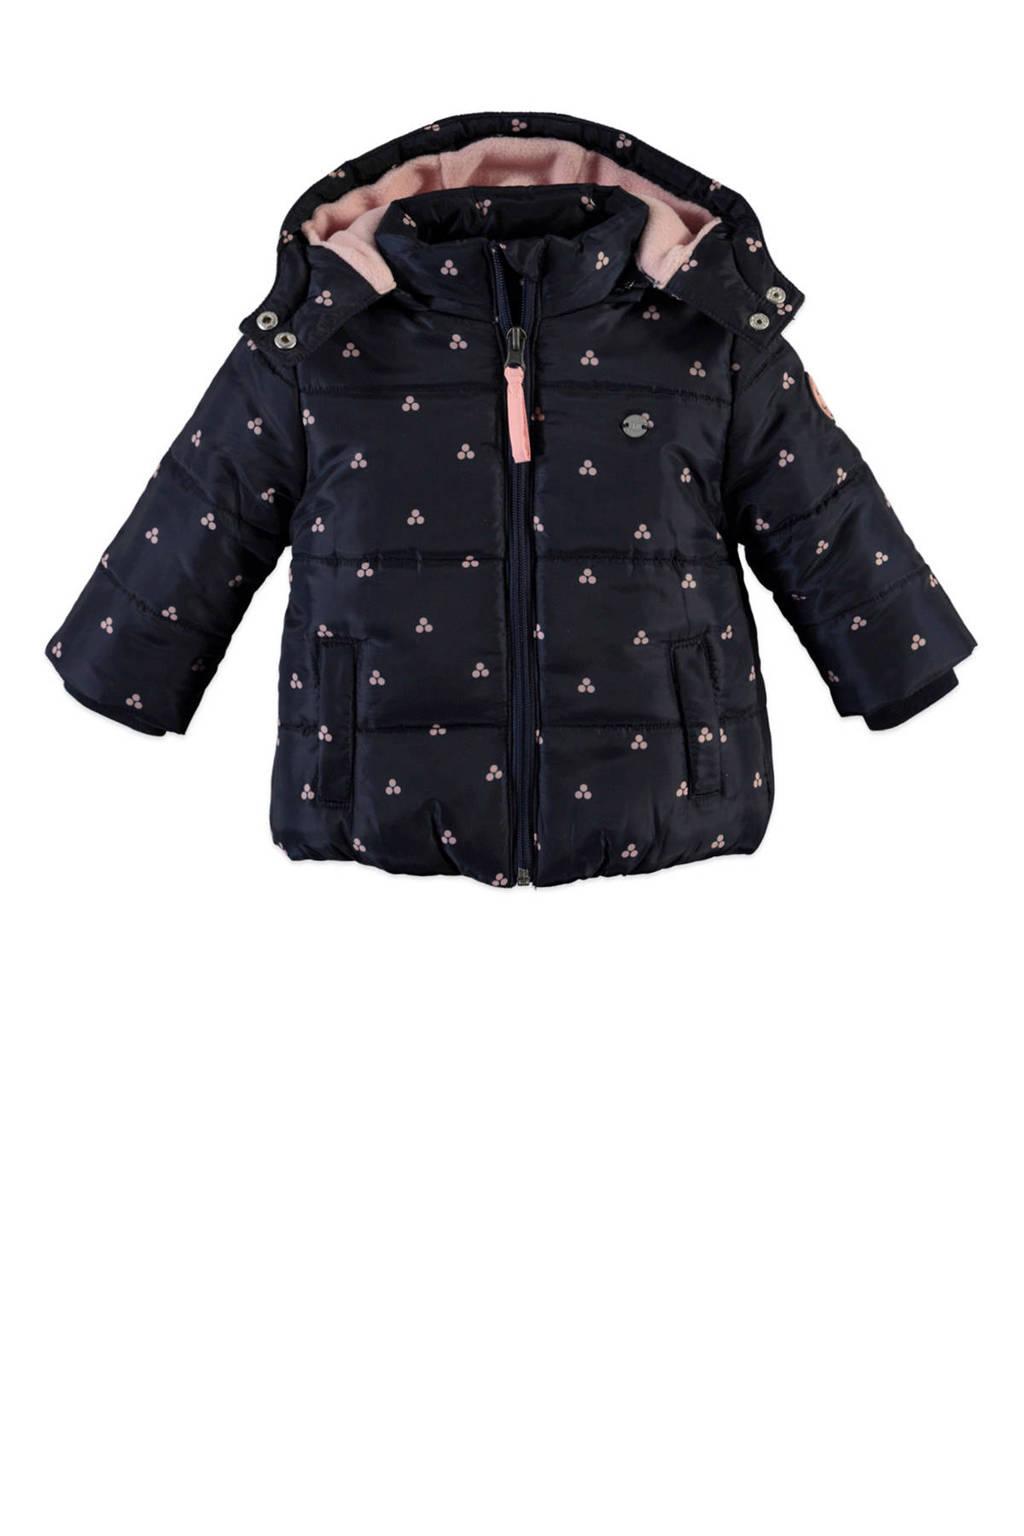 Babyface winterjas met all over print donkerblauw/roze, Donkerblauw/roze